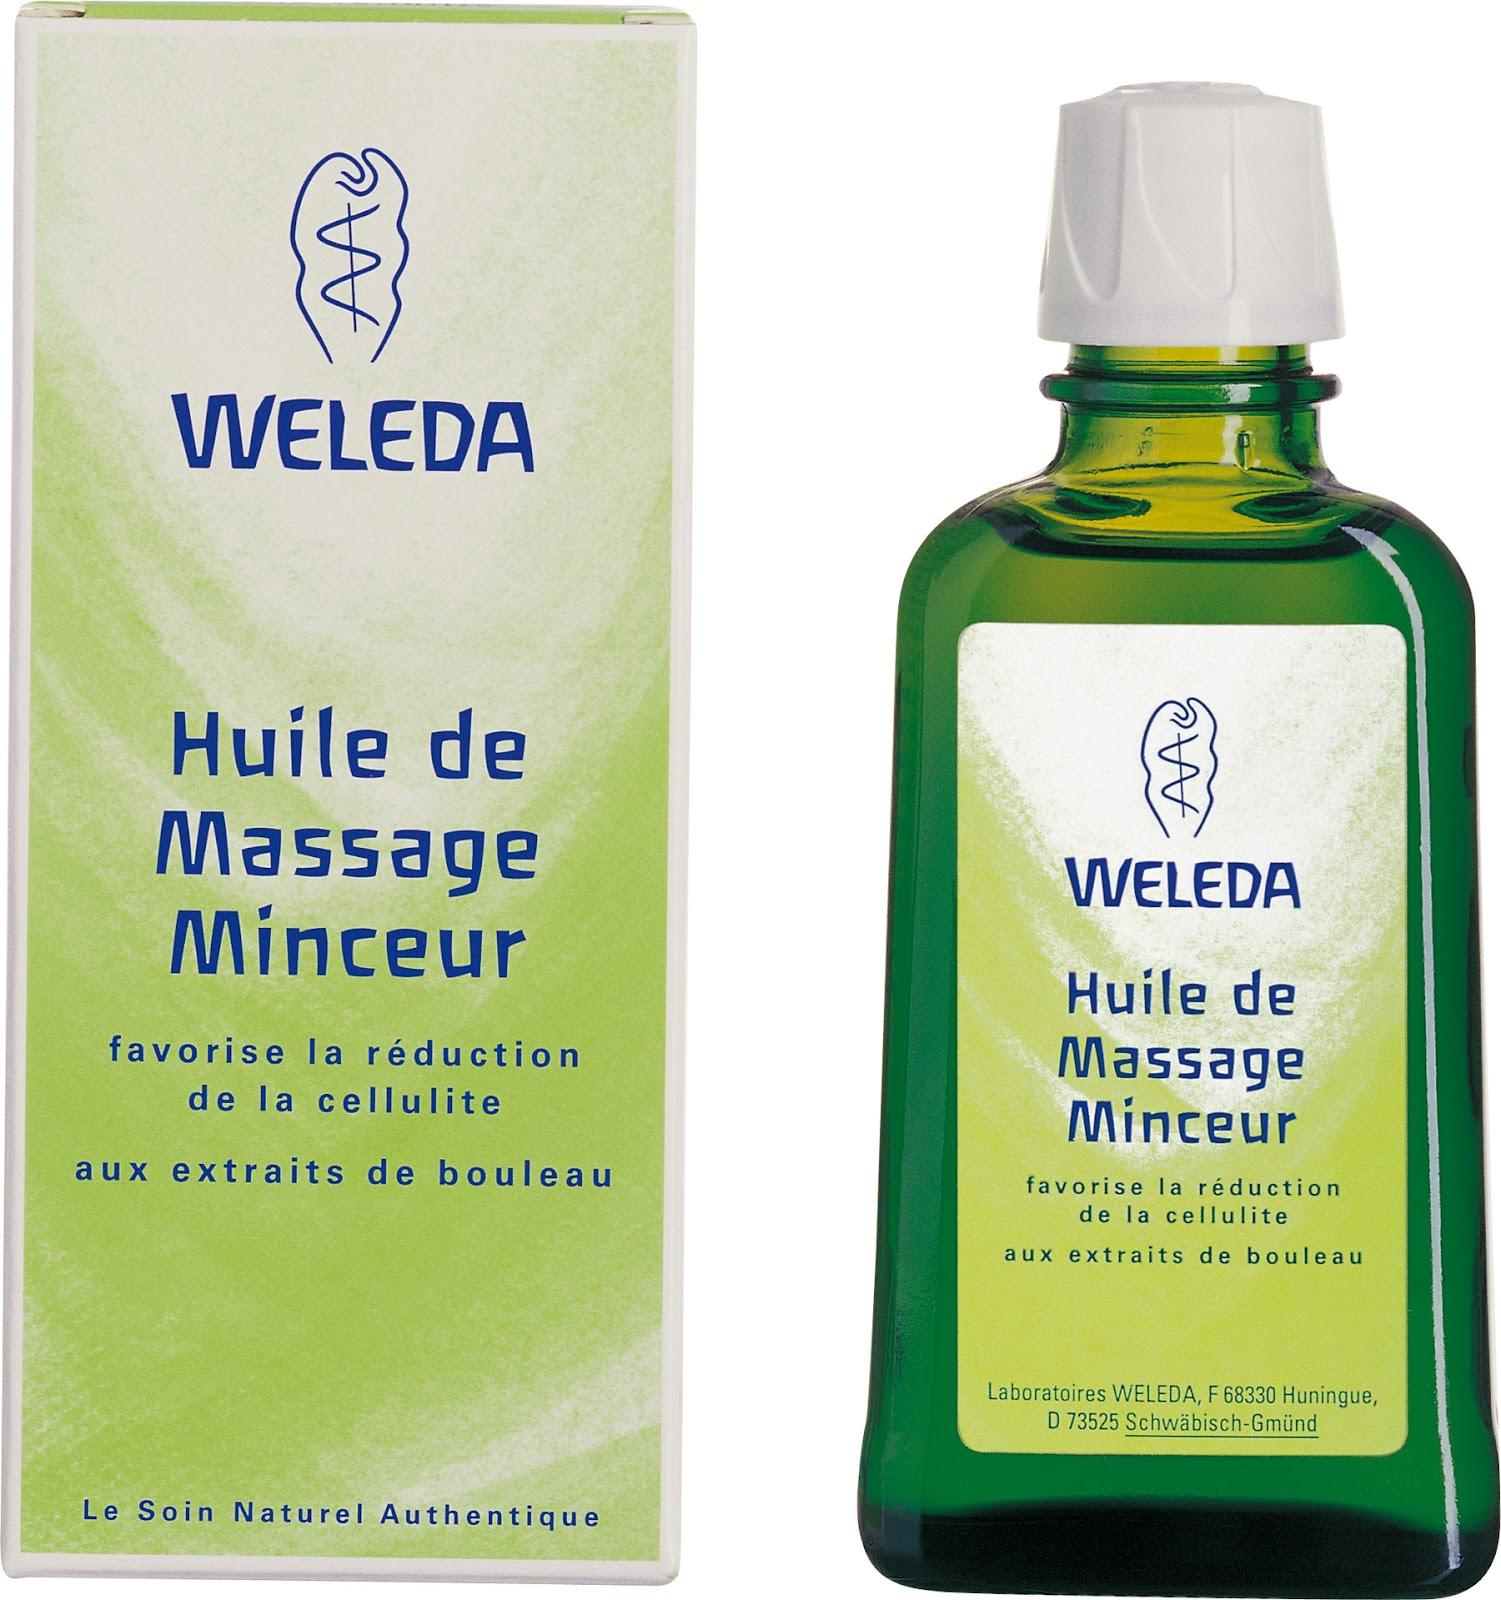 Huile de massage minceur Weleda